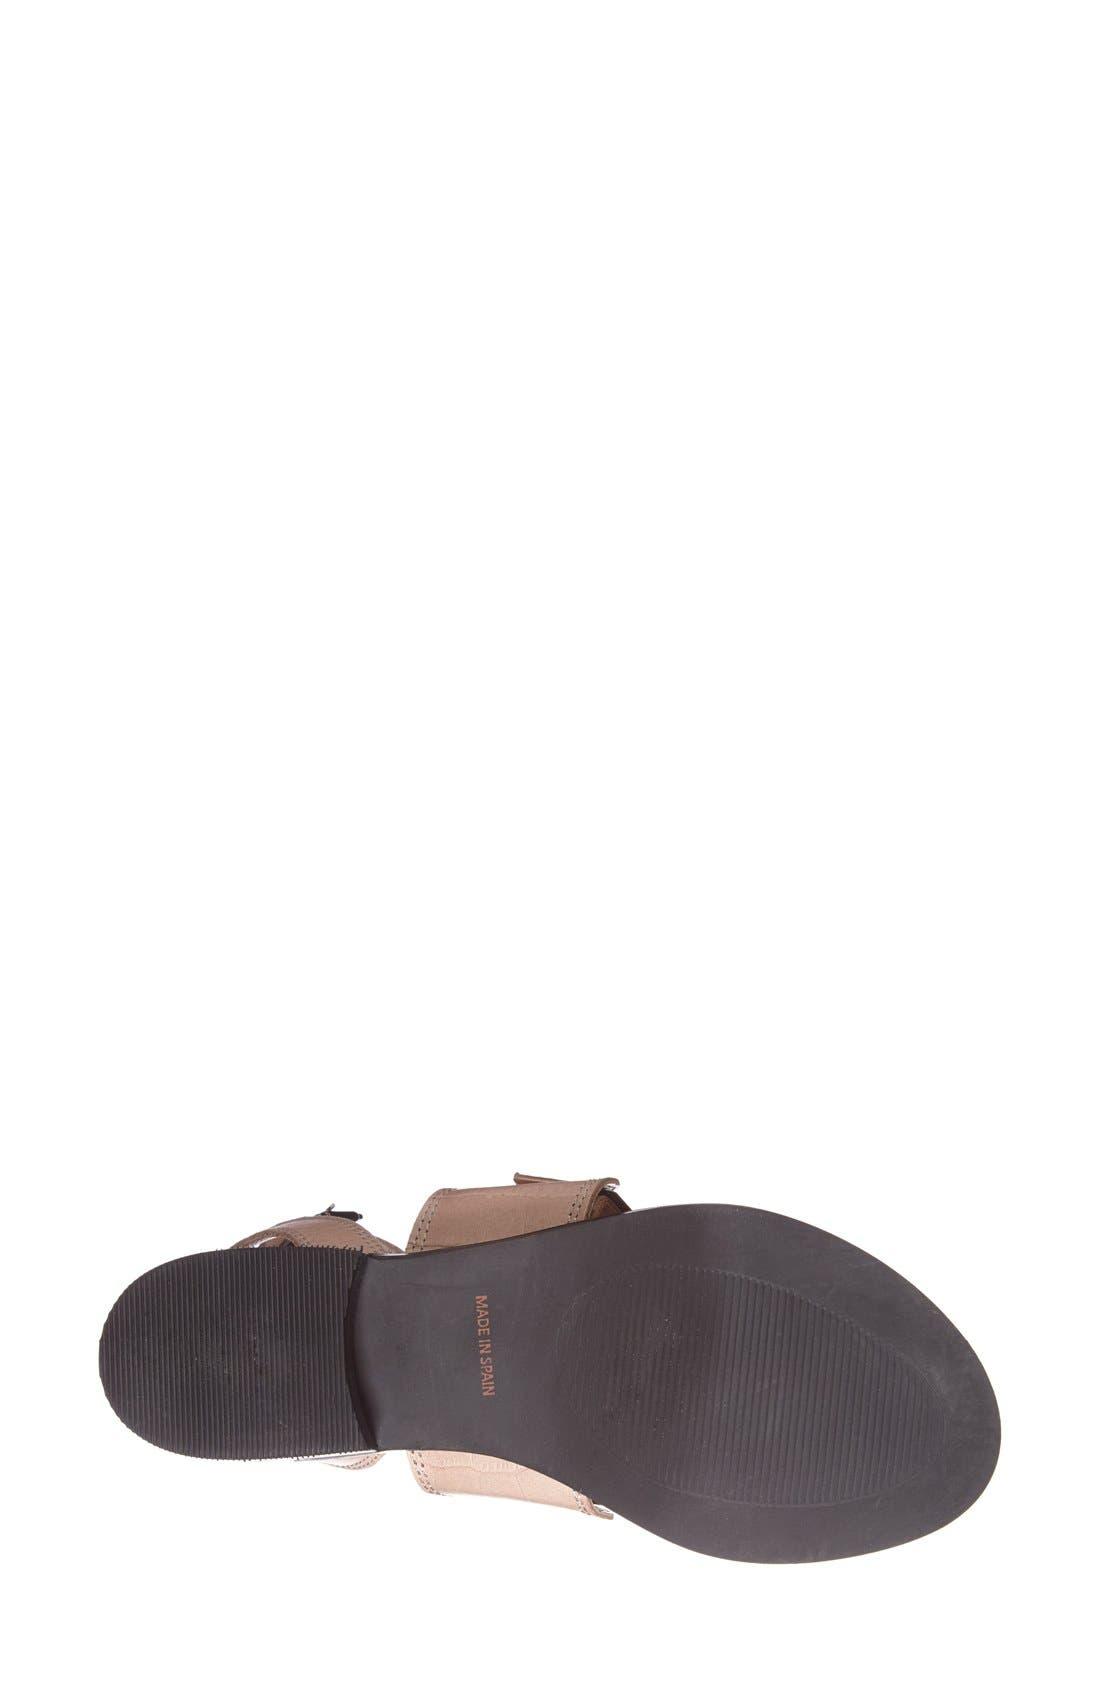 Alternate Image 4  - Topshop 'Premium - Preeta' Ankle Strap Sandal (Women)